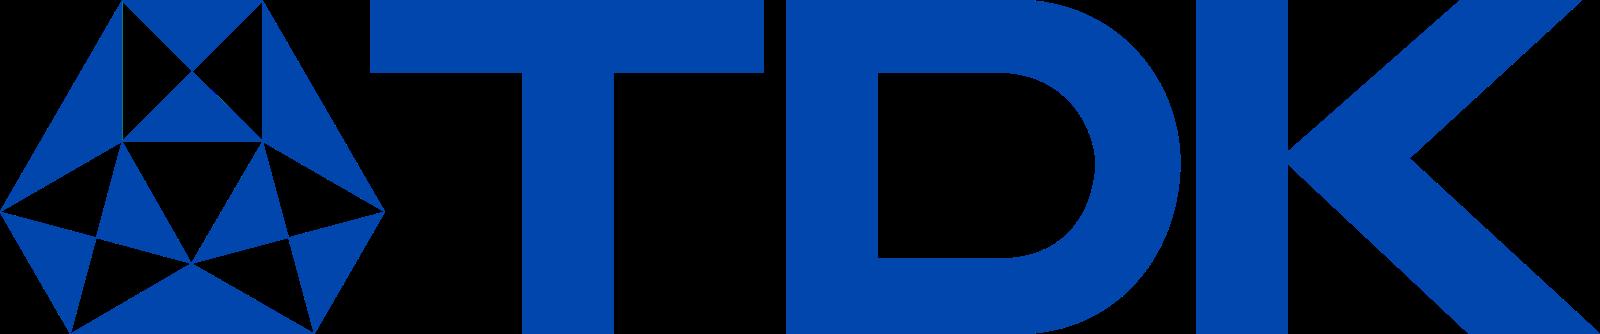 tdk logo 6 - TDK Logo